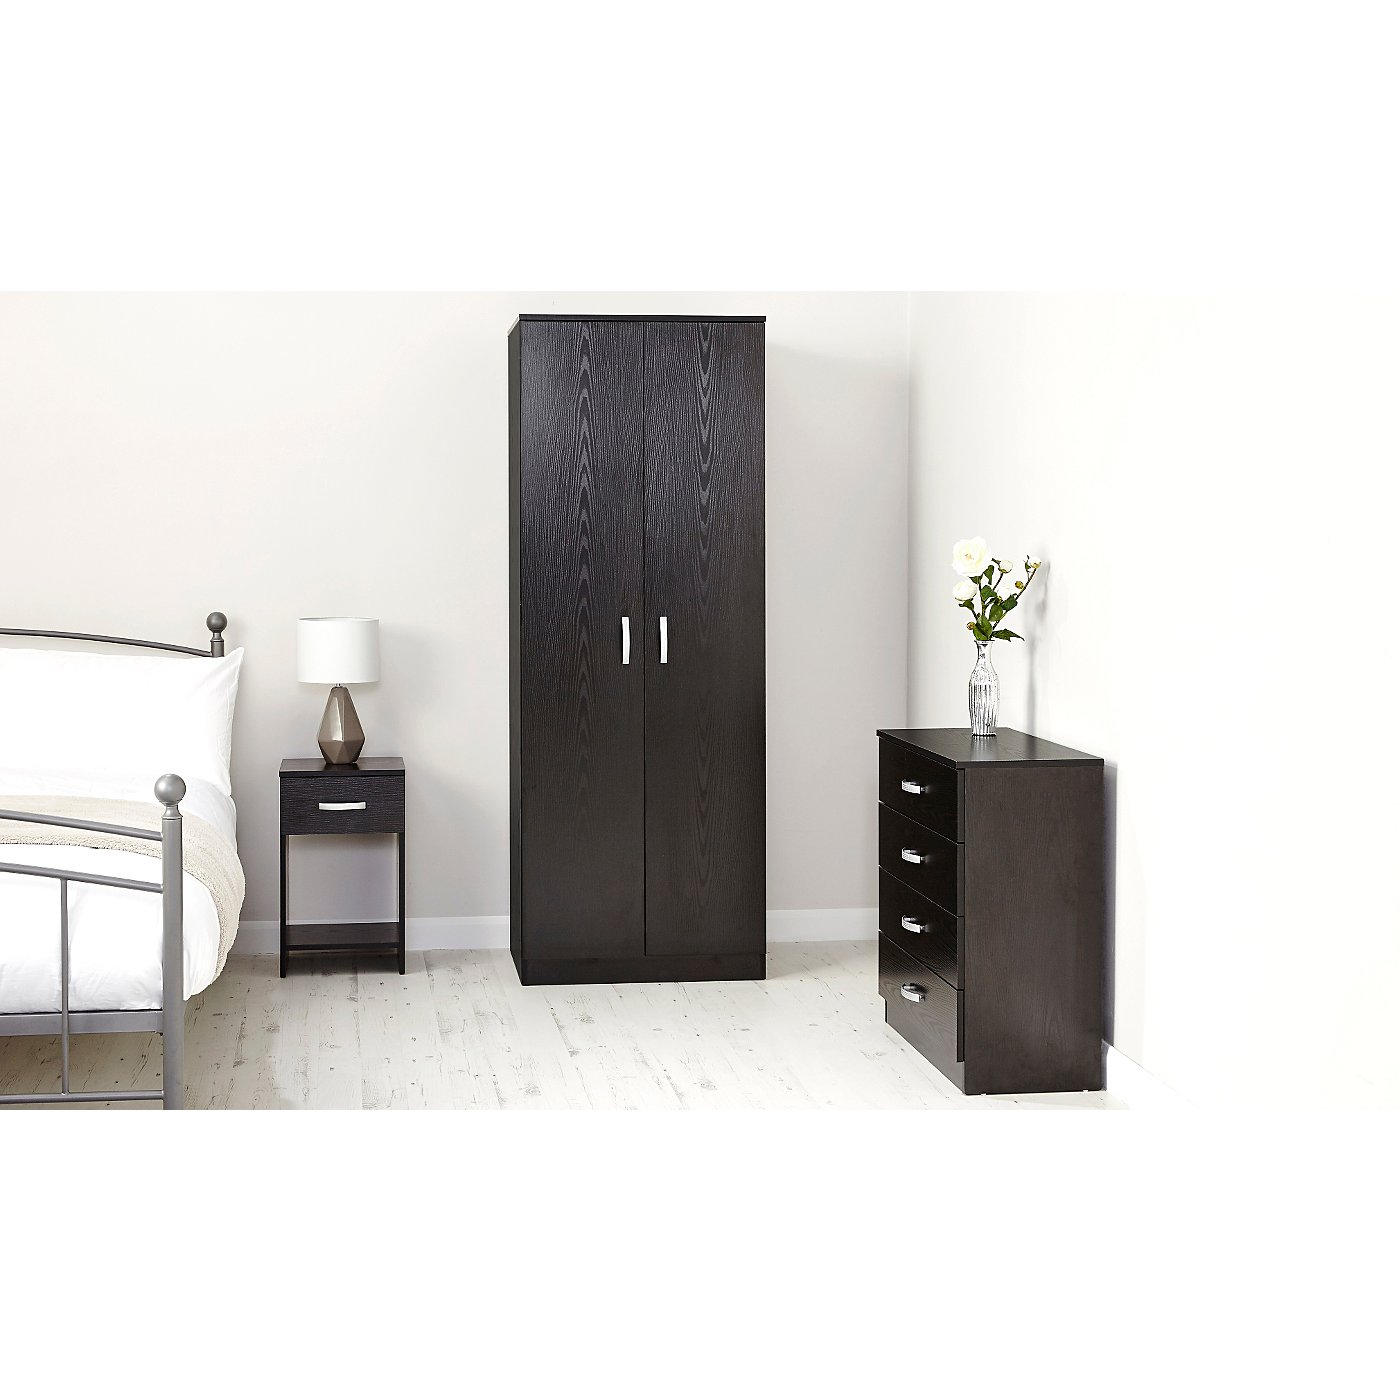 George Home Marlow Bedroom Furniture Range   Black Ash Effect  Loading zoom. George Home Marlow Bedroom Furniture Range   Black Ash Effect